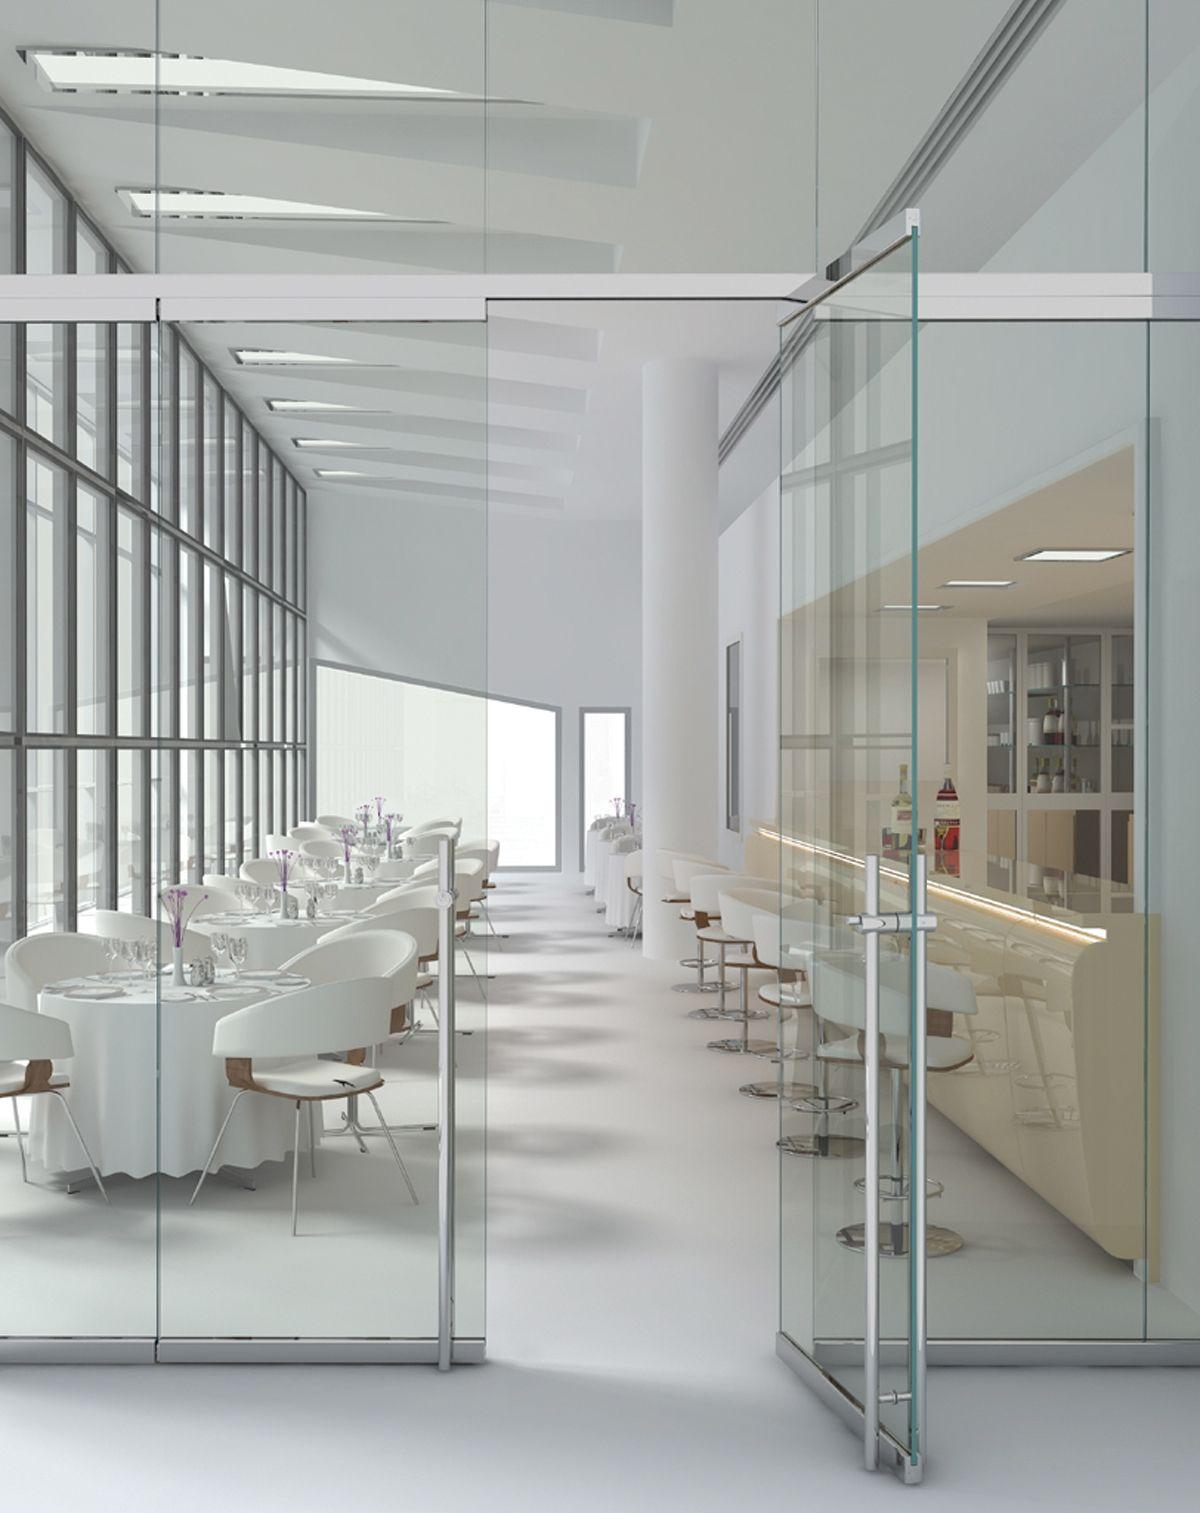 frameless glass door details - Google Search & frameless glass door details - Google Search | Bars \u0026 Restaurants ... Pezcame.Com